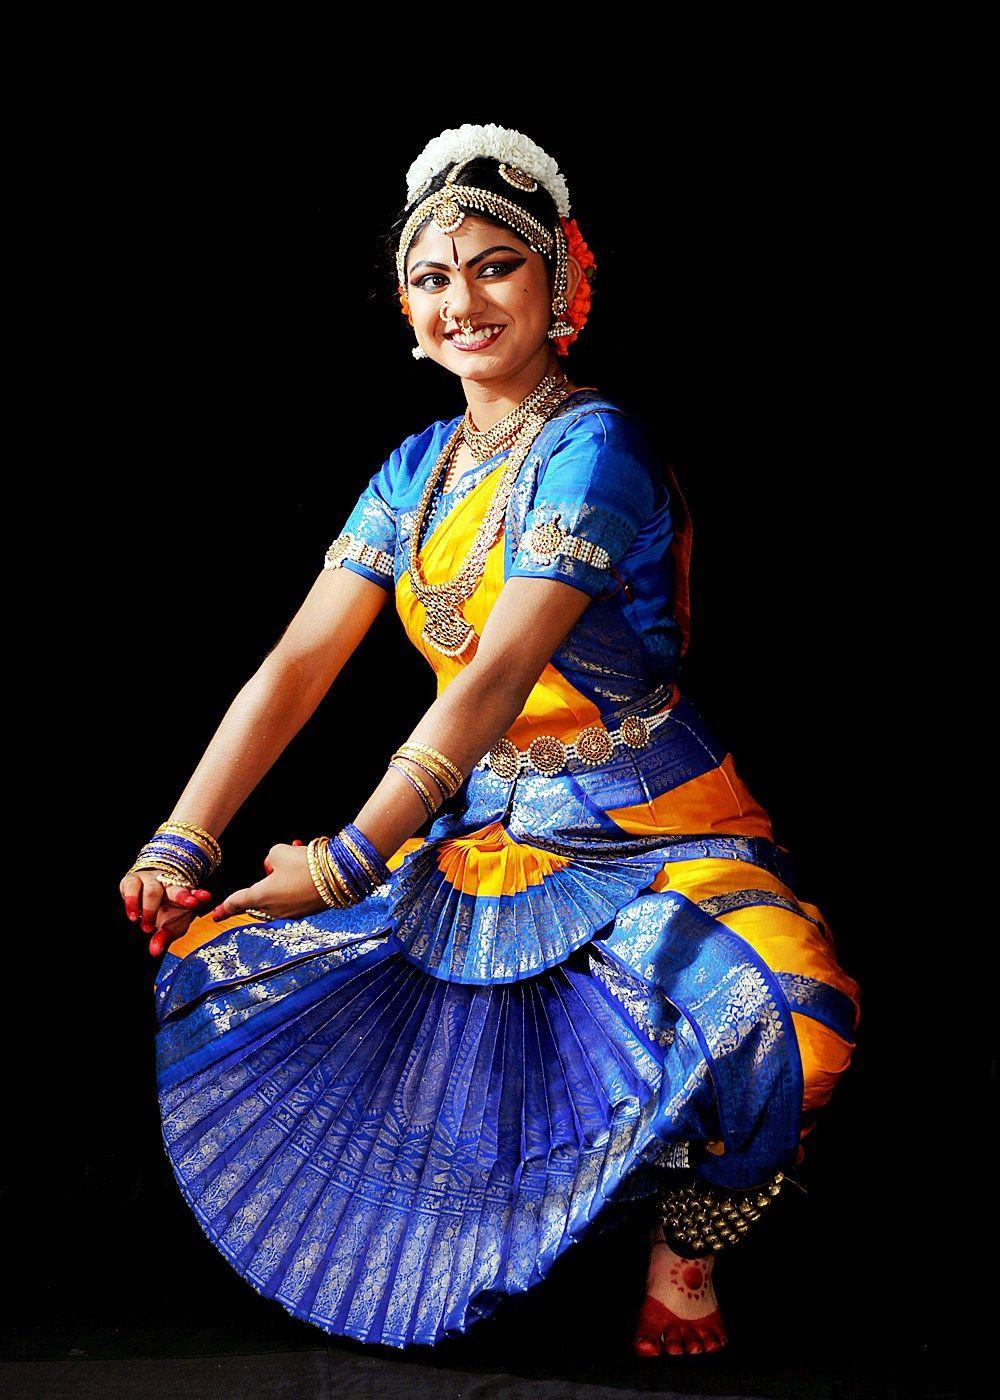 bharatanatyam poses - photo #36